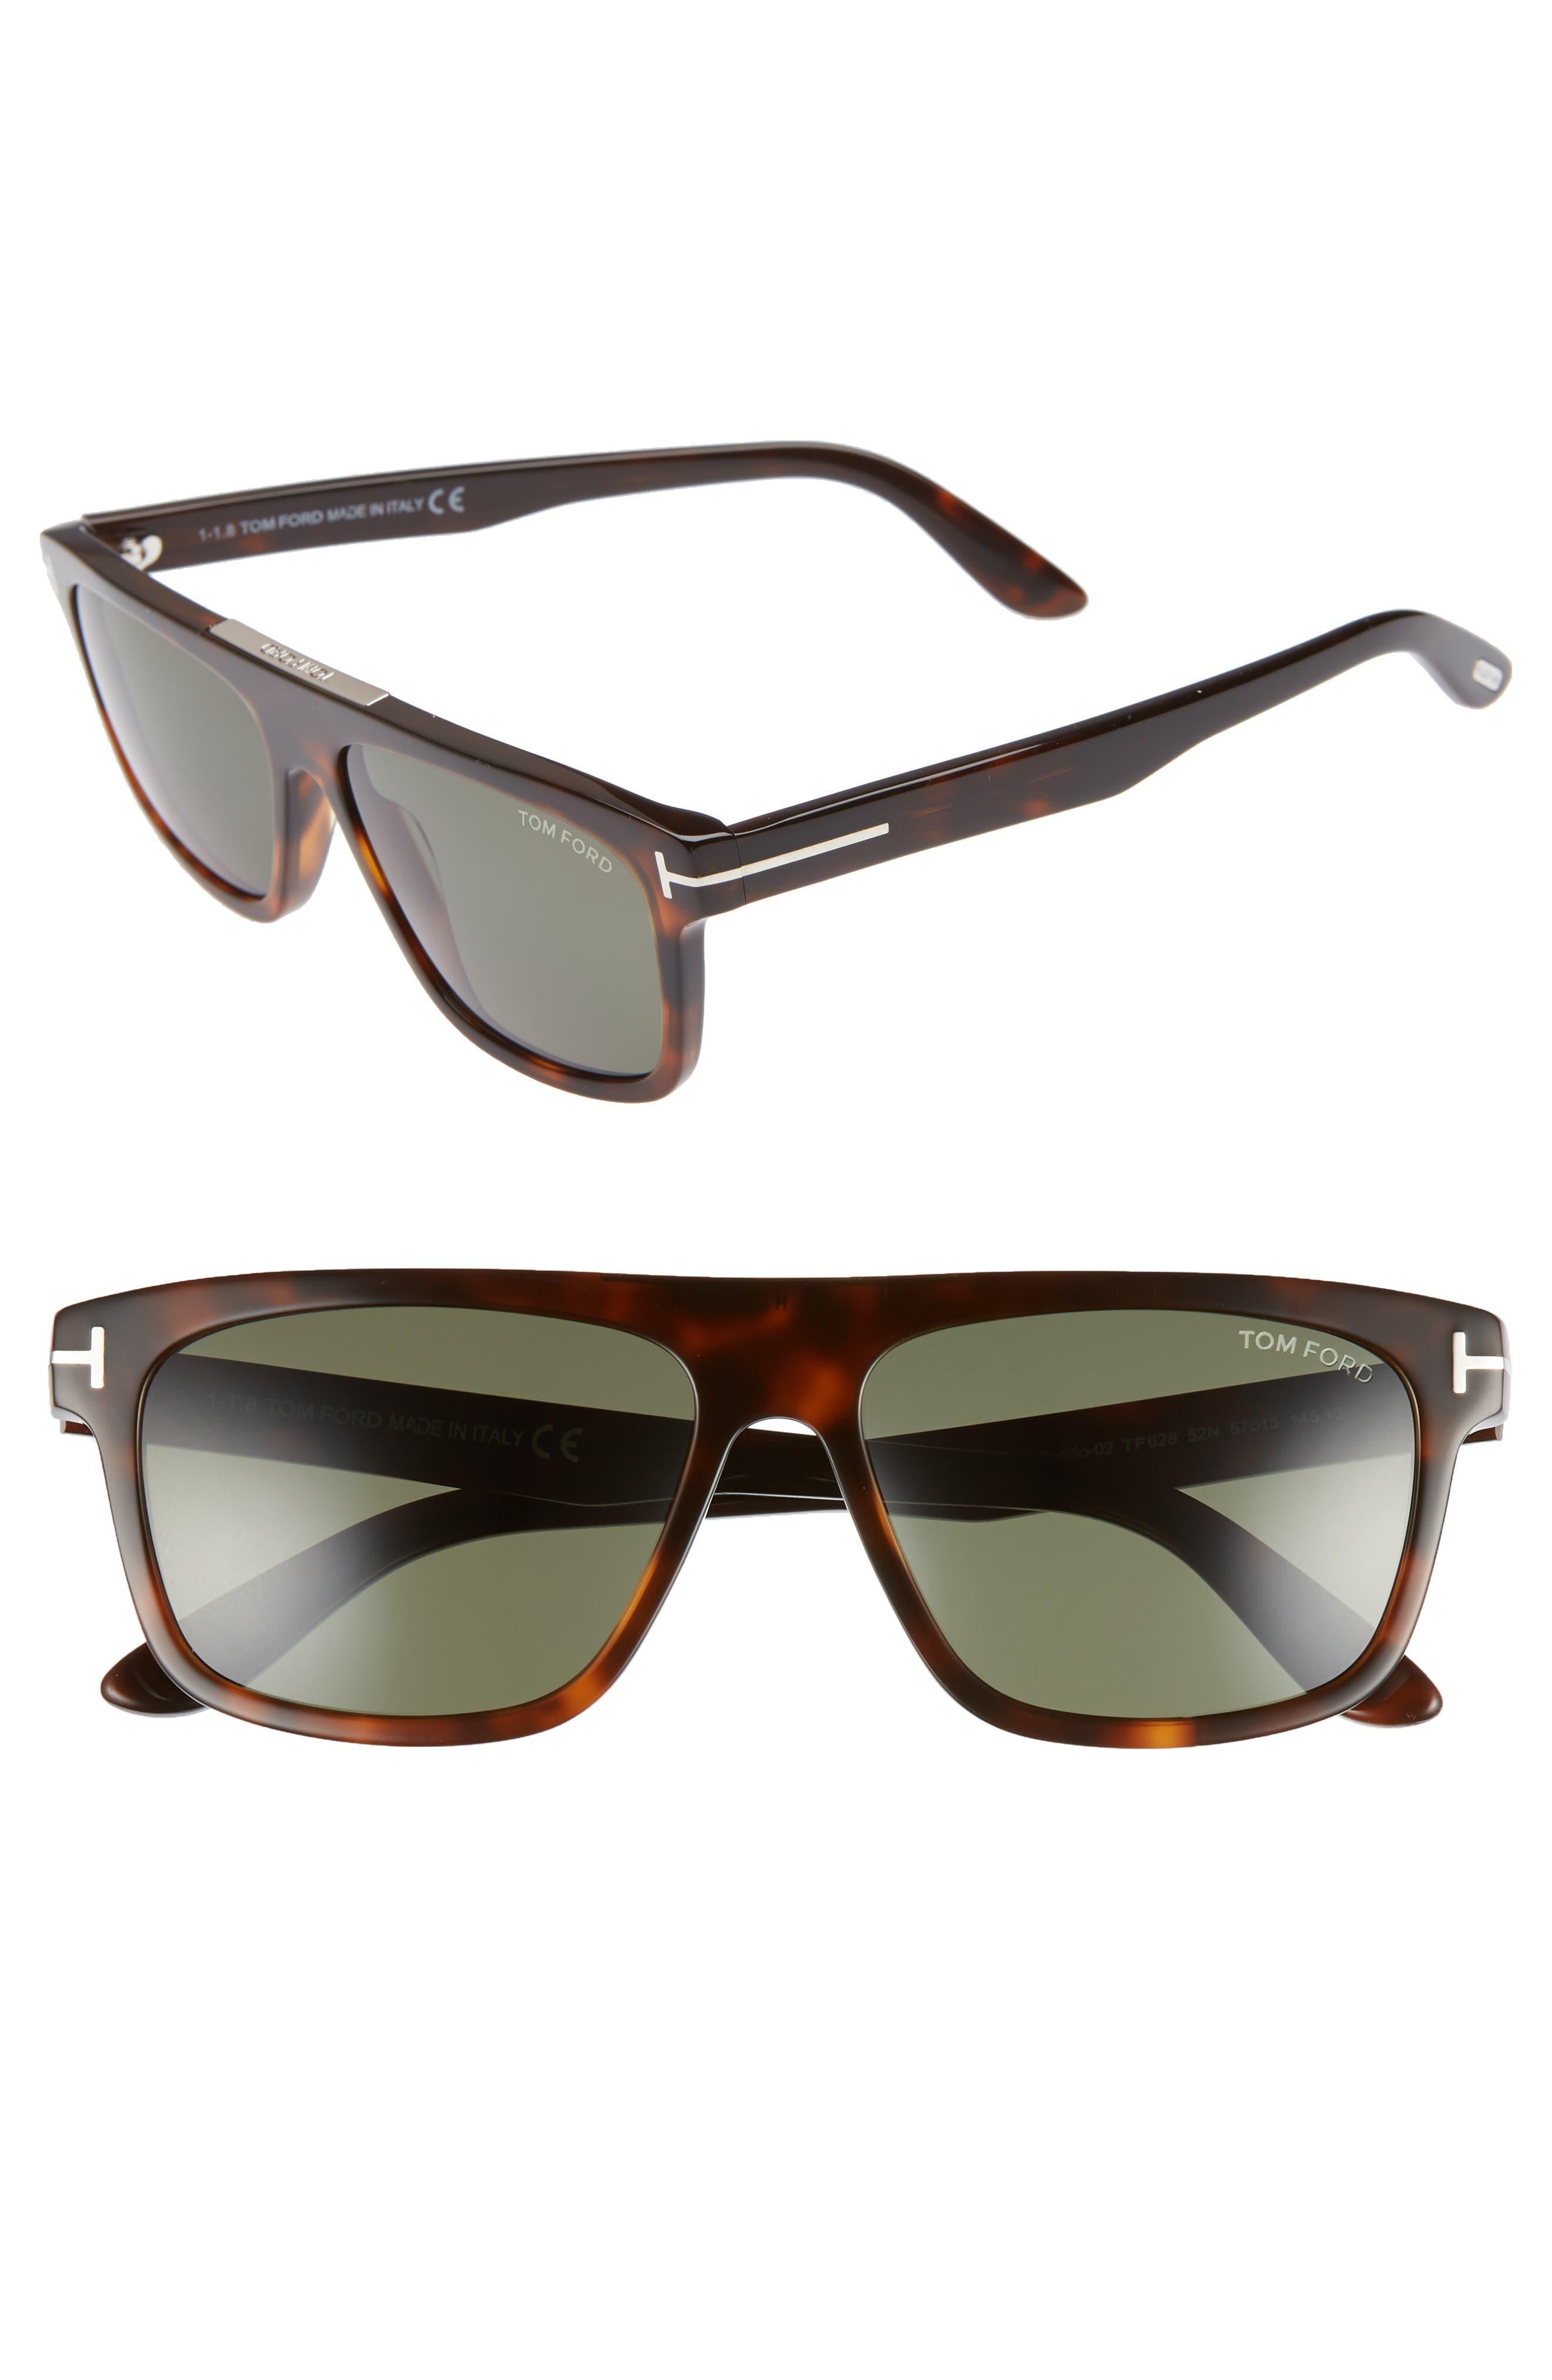 Tom Ford Cecilio 57Mm Blue Block Optical Glasses - Dark Havana/ Green